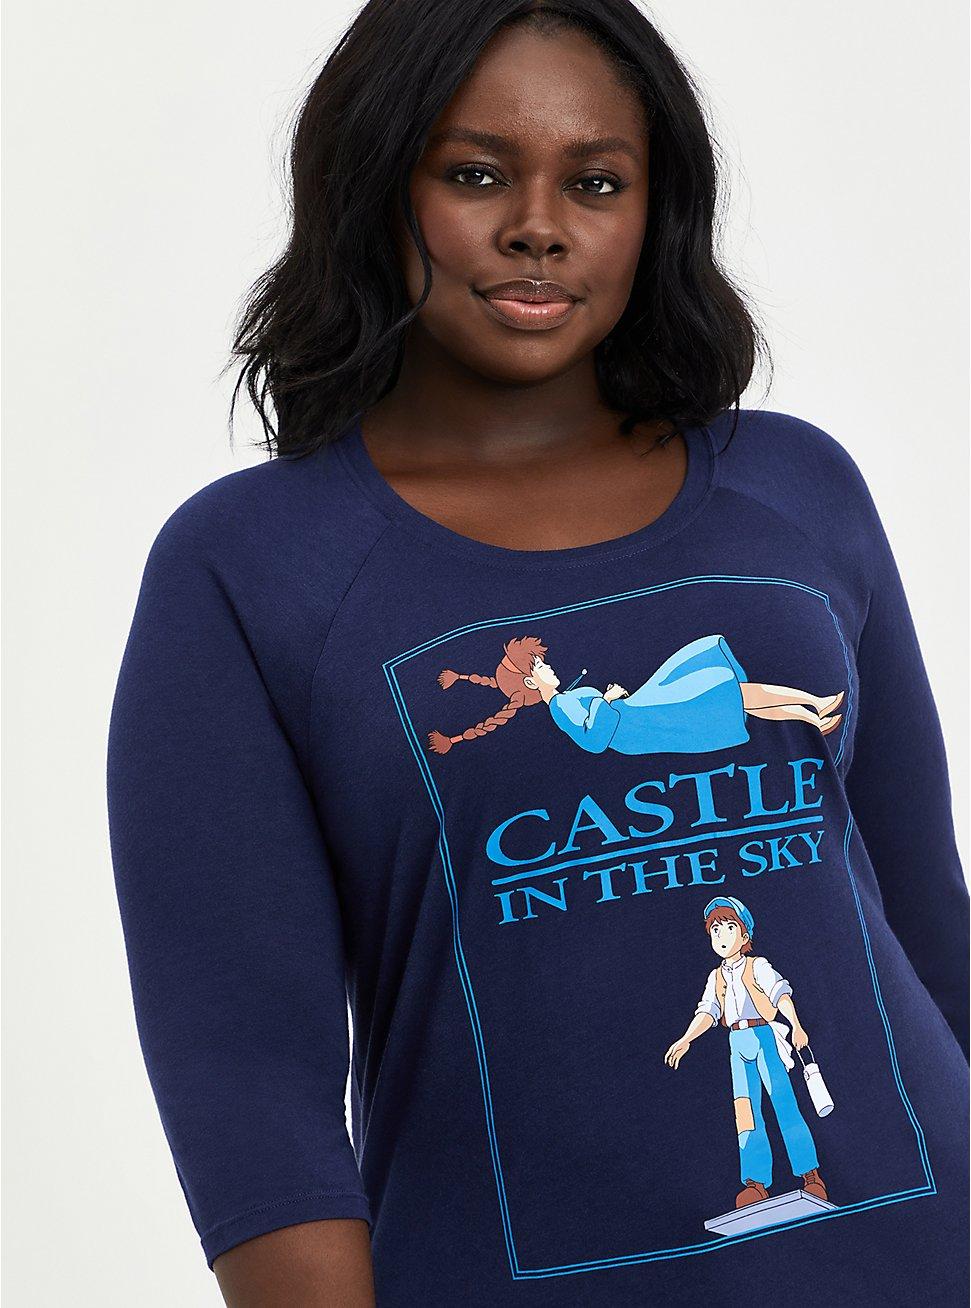 Her Universe Studio Ghibli Raglan Top - Heritage Slub Castle In The Sky Black, PEACOAT, hi-res